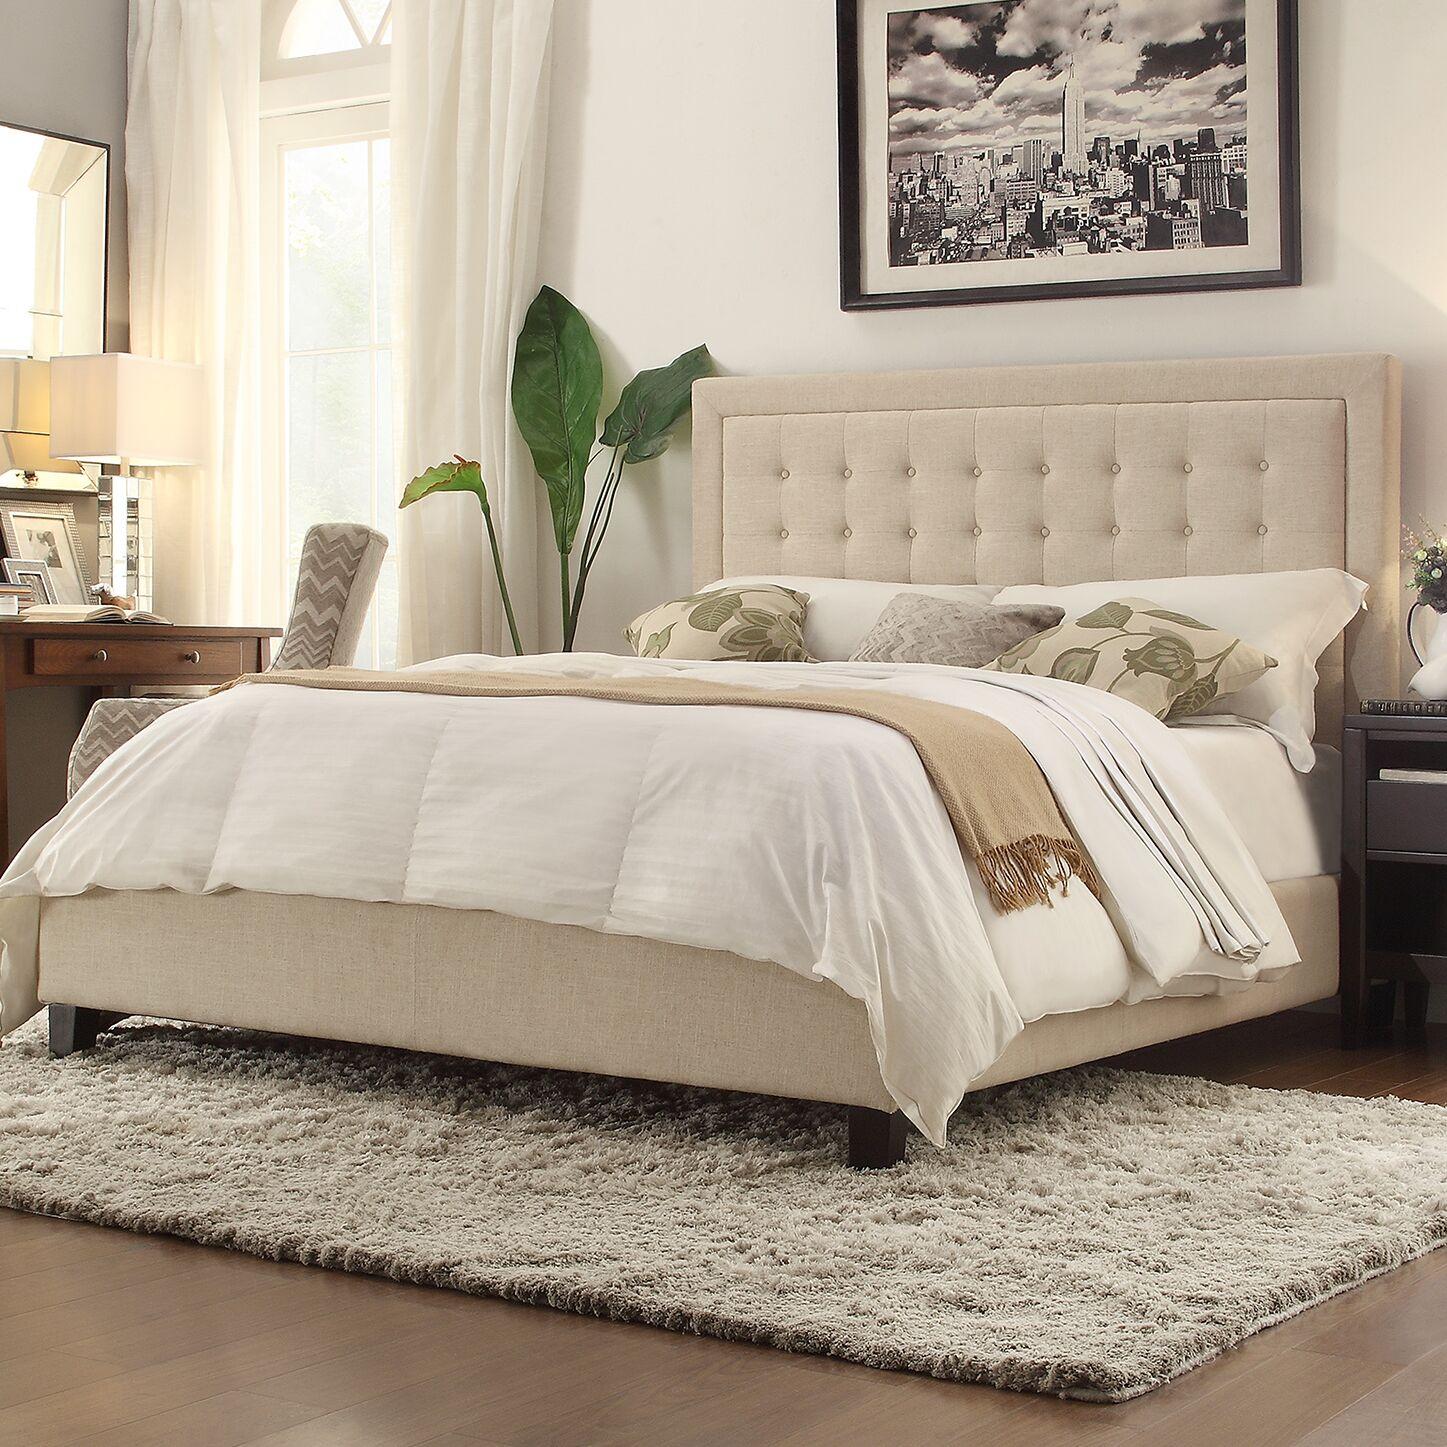 Sefton Upholstered Panel Bed Color: Beige, Size: Queen